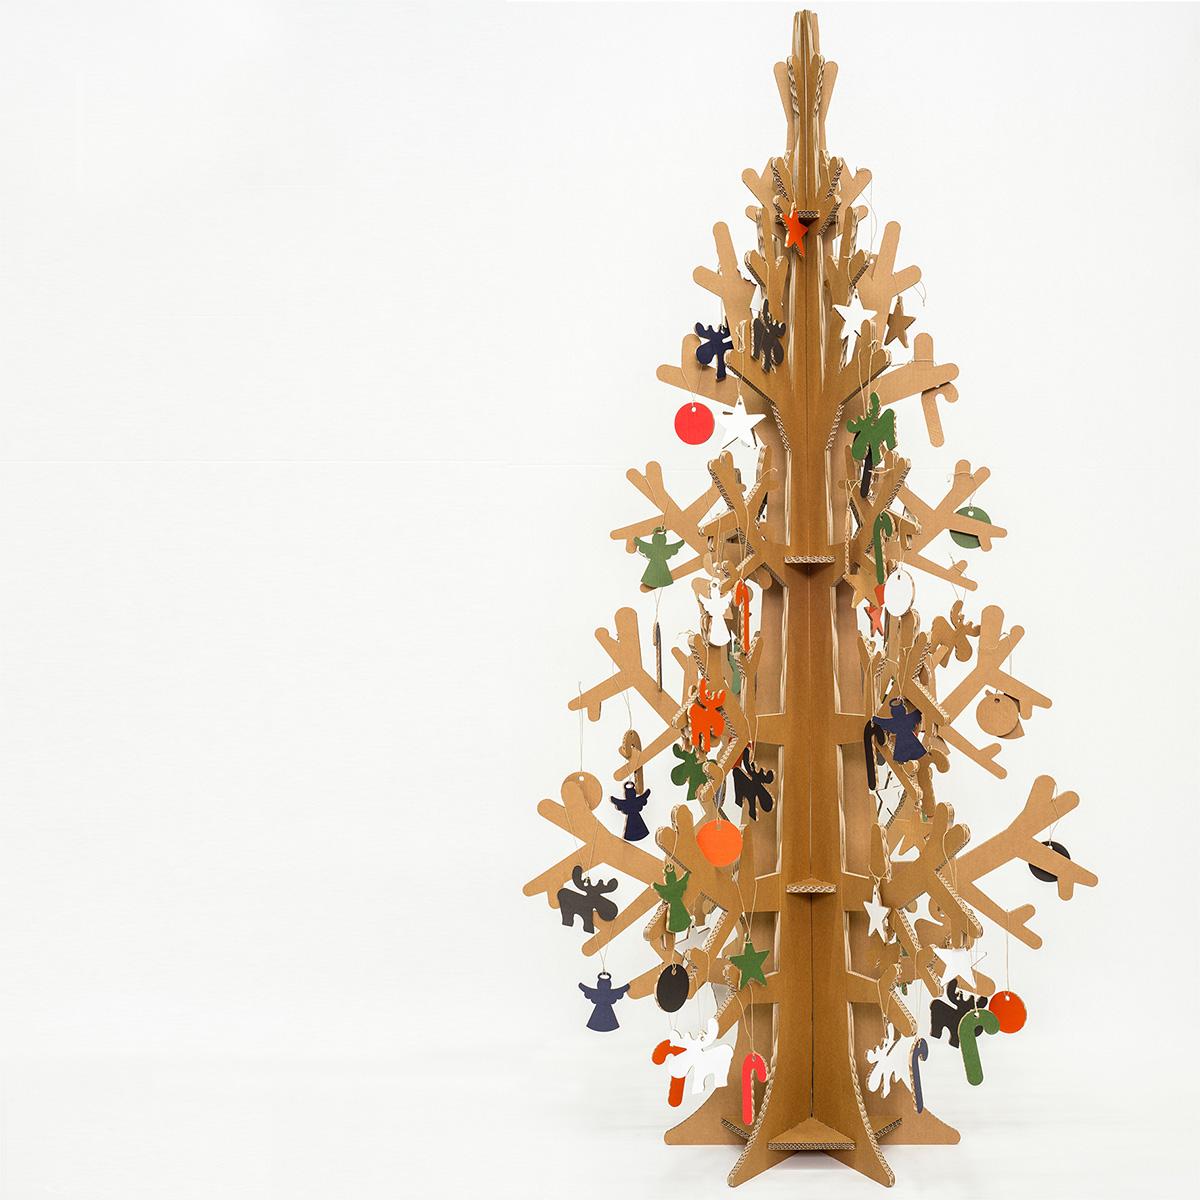 https://www.uncadesign.com/wp-content/uploads/2020/11/ChristmasXunca_0000s_0021_albero-01-2.jpg